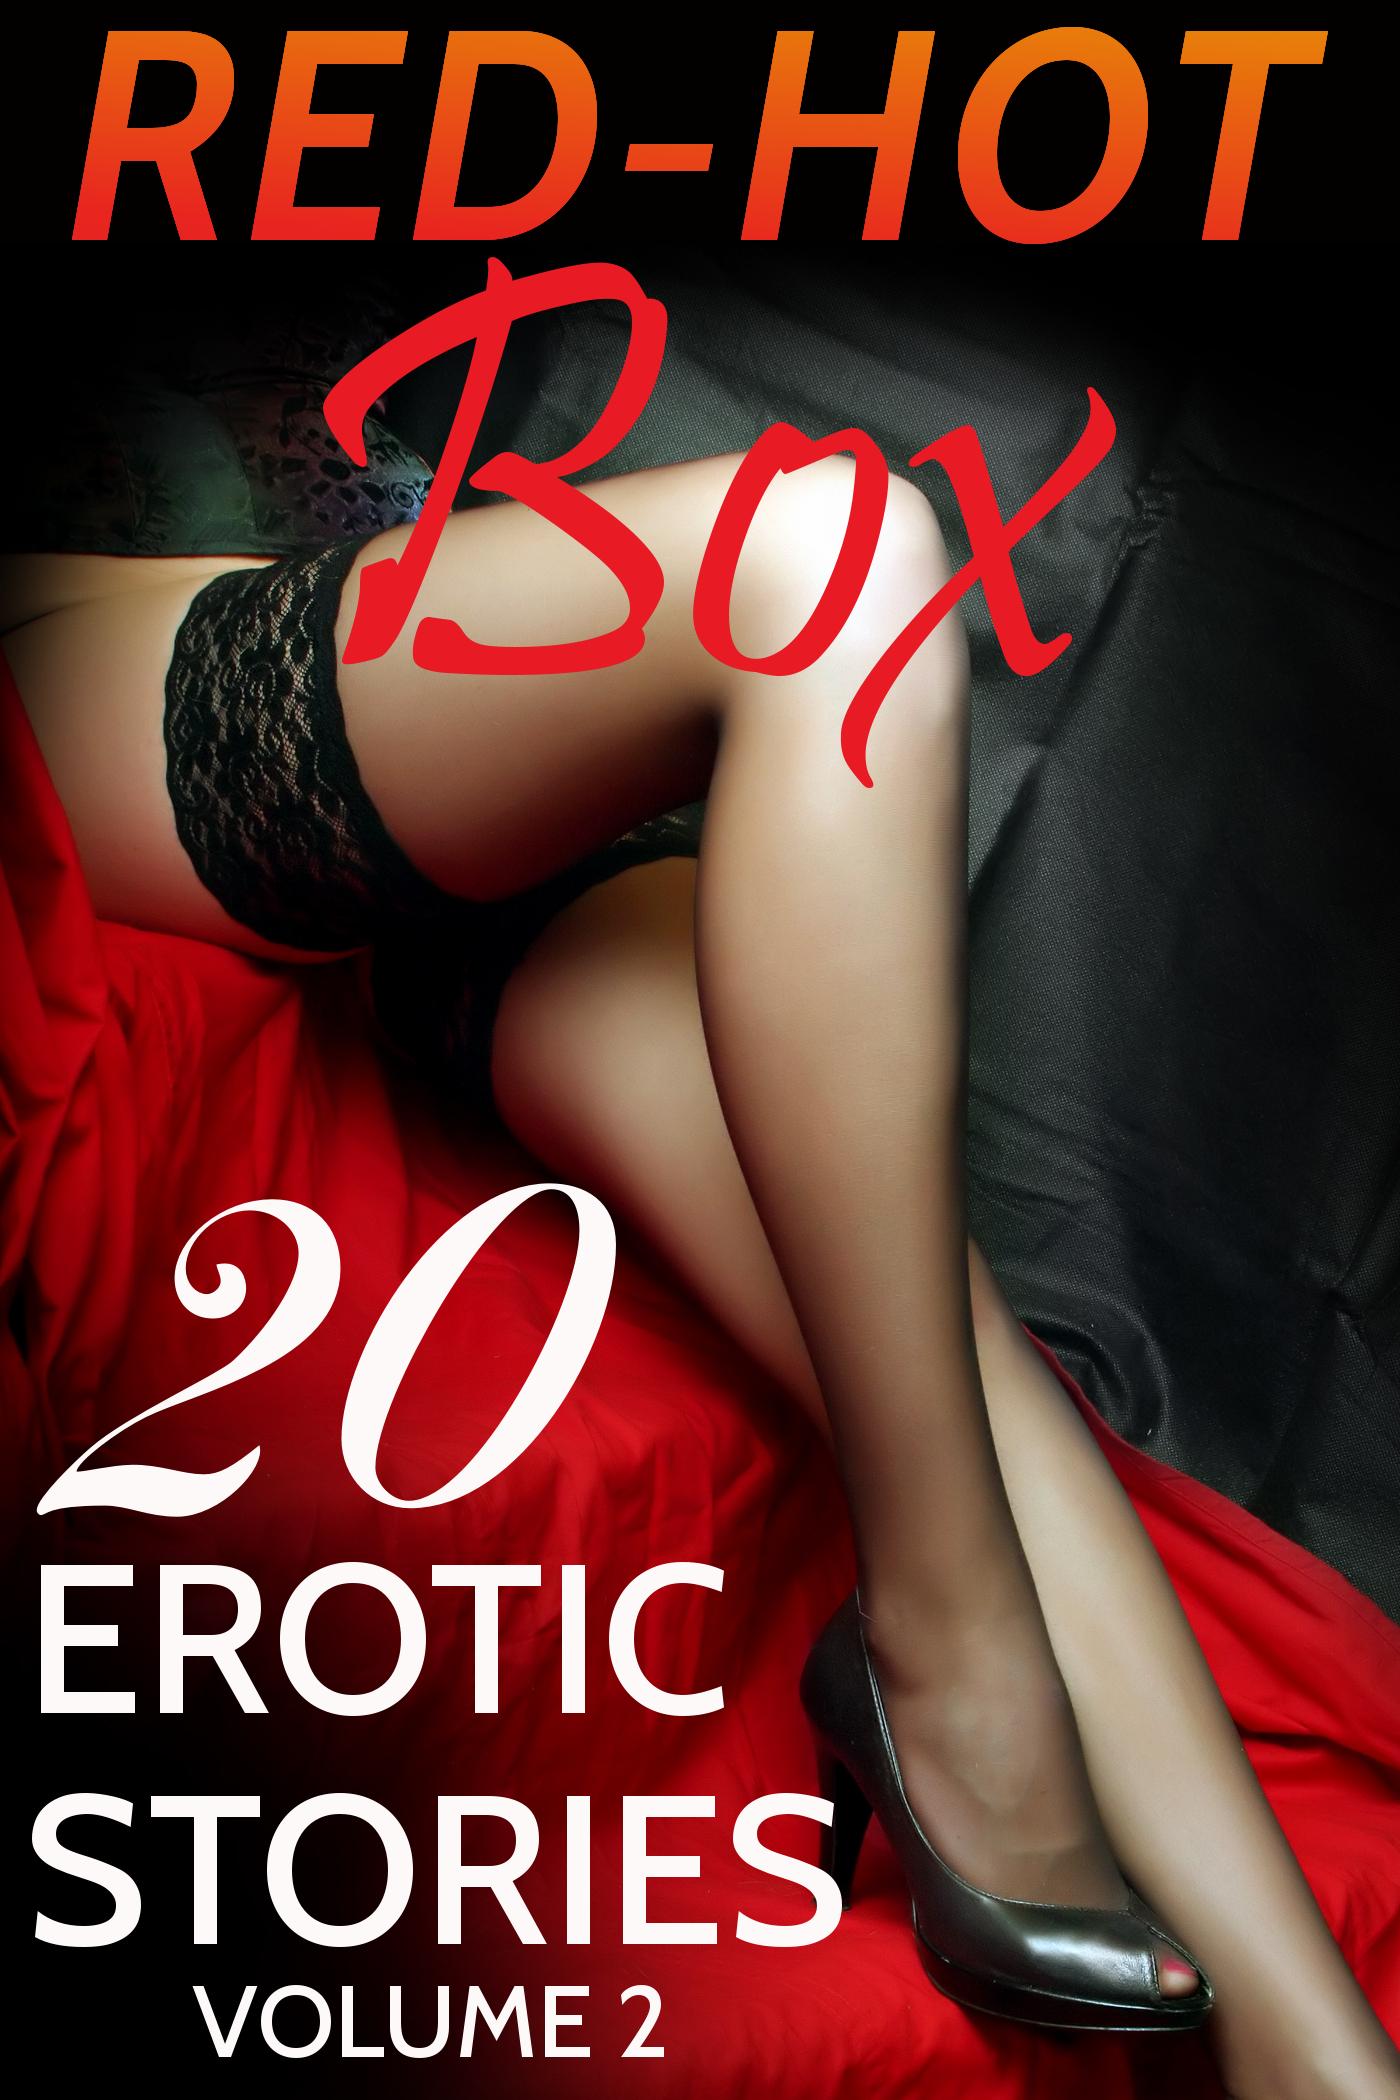 Erotic fiction free sex story, big white tits xxx